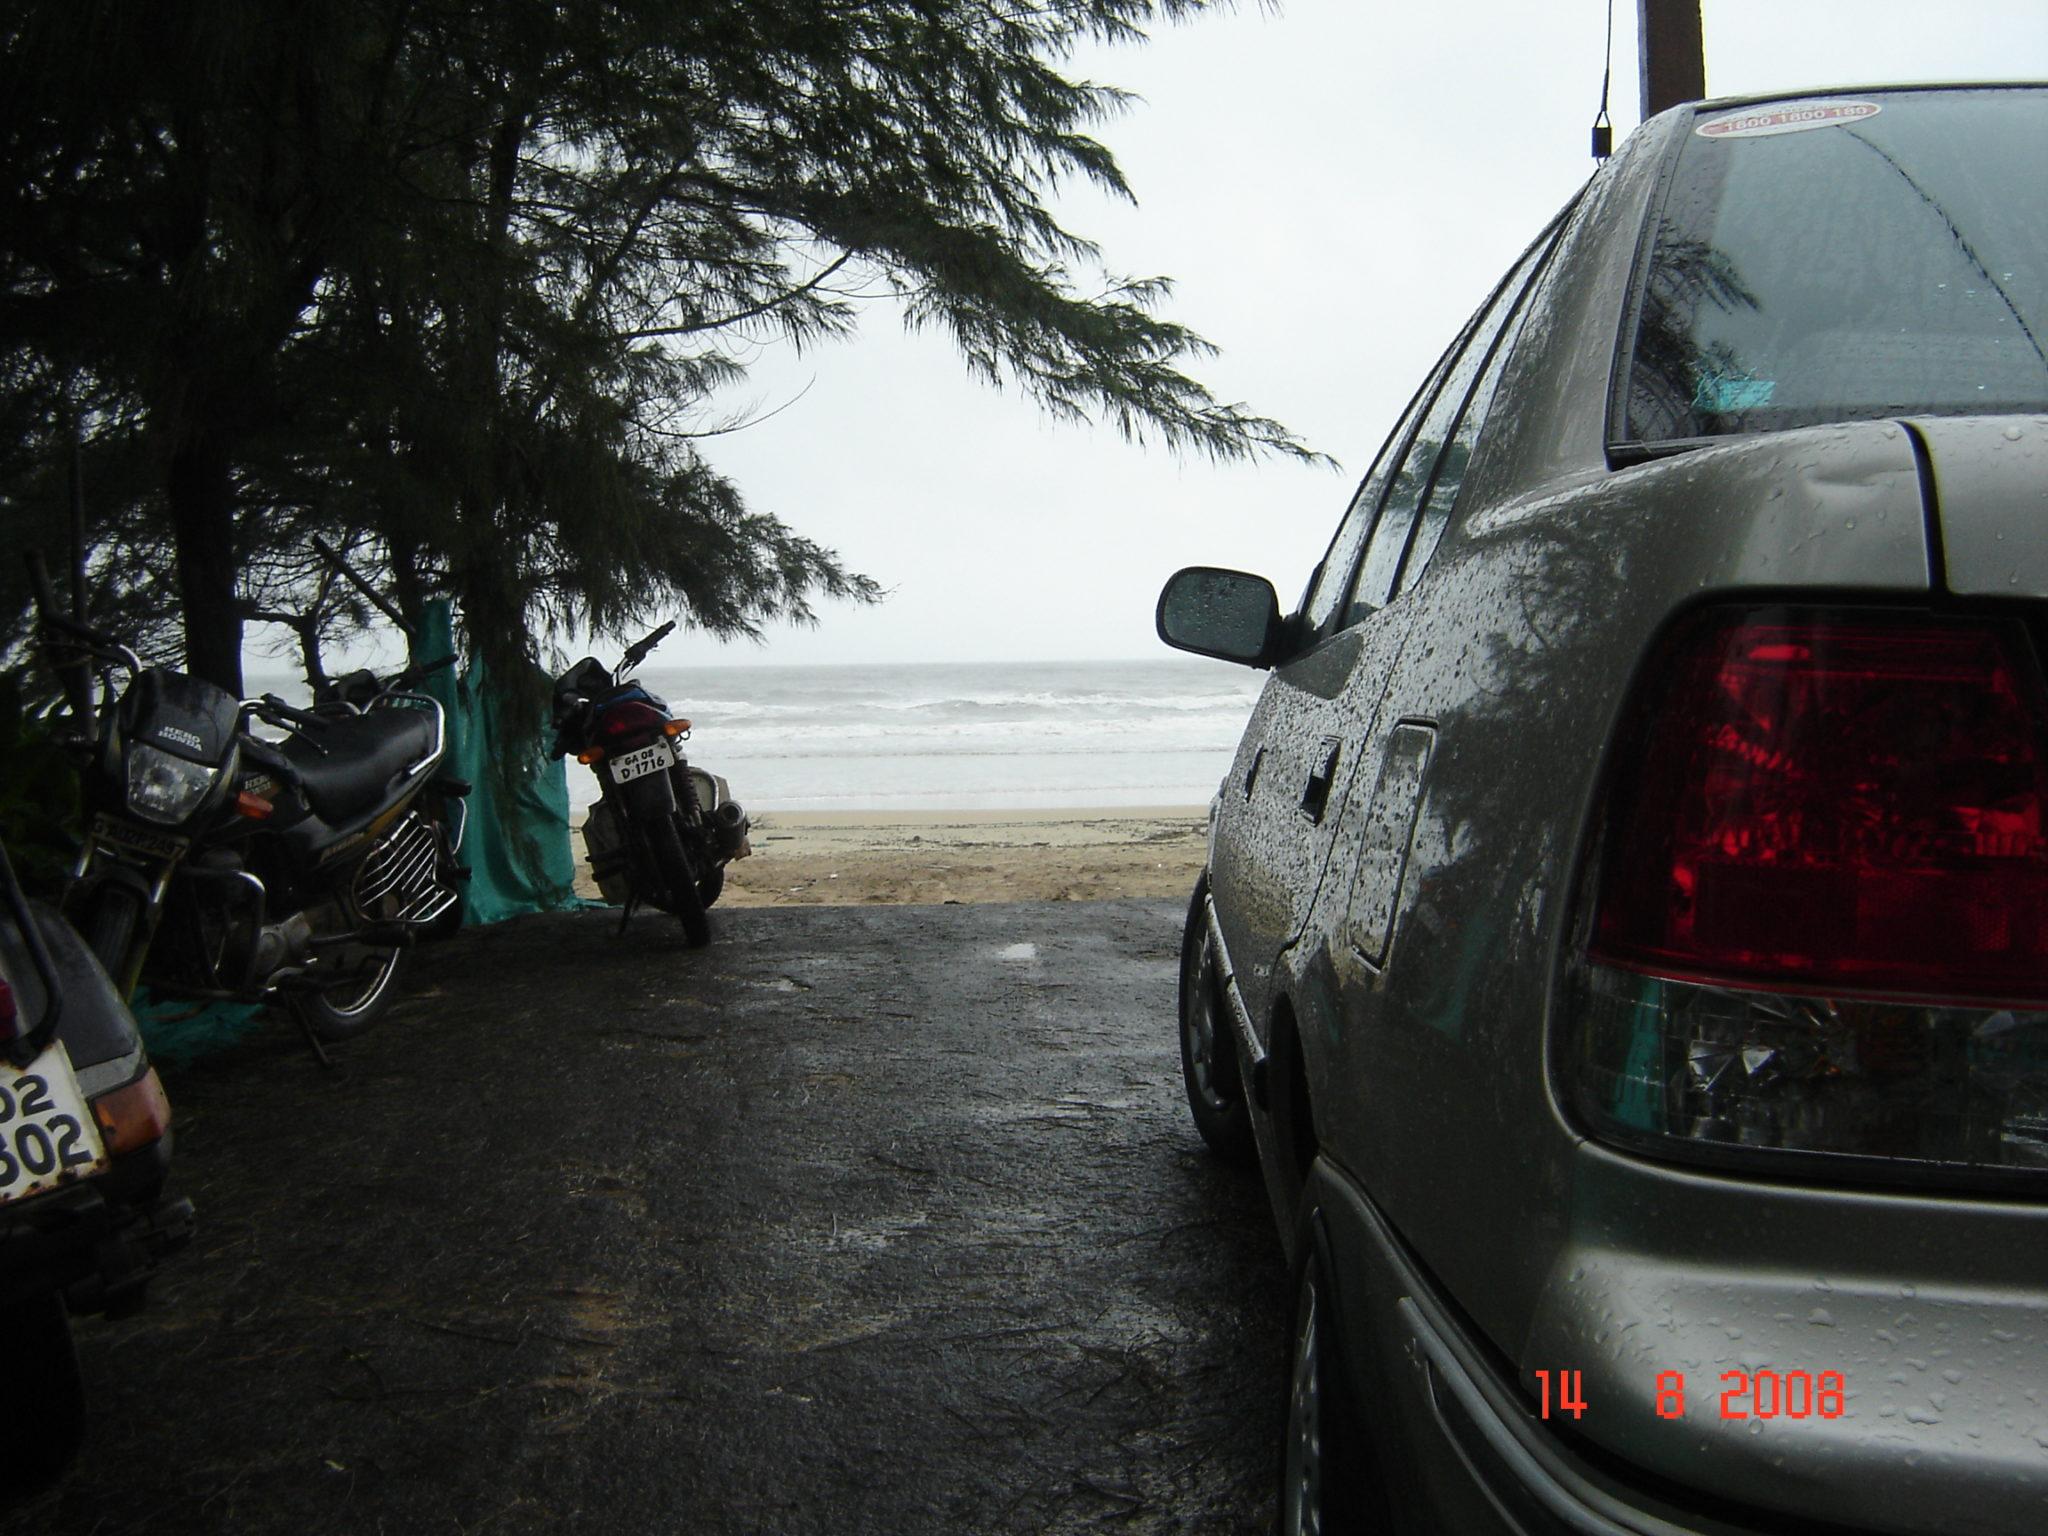 At Leela beach